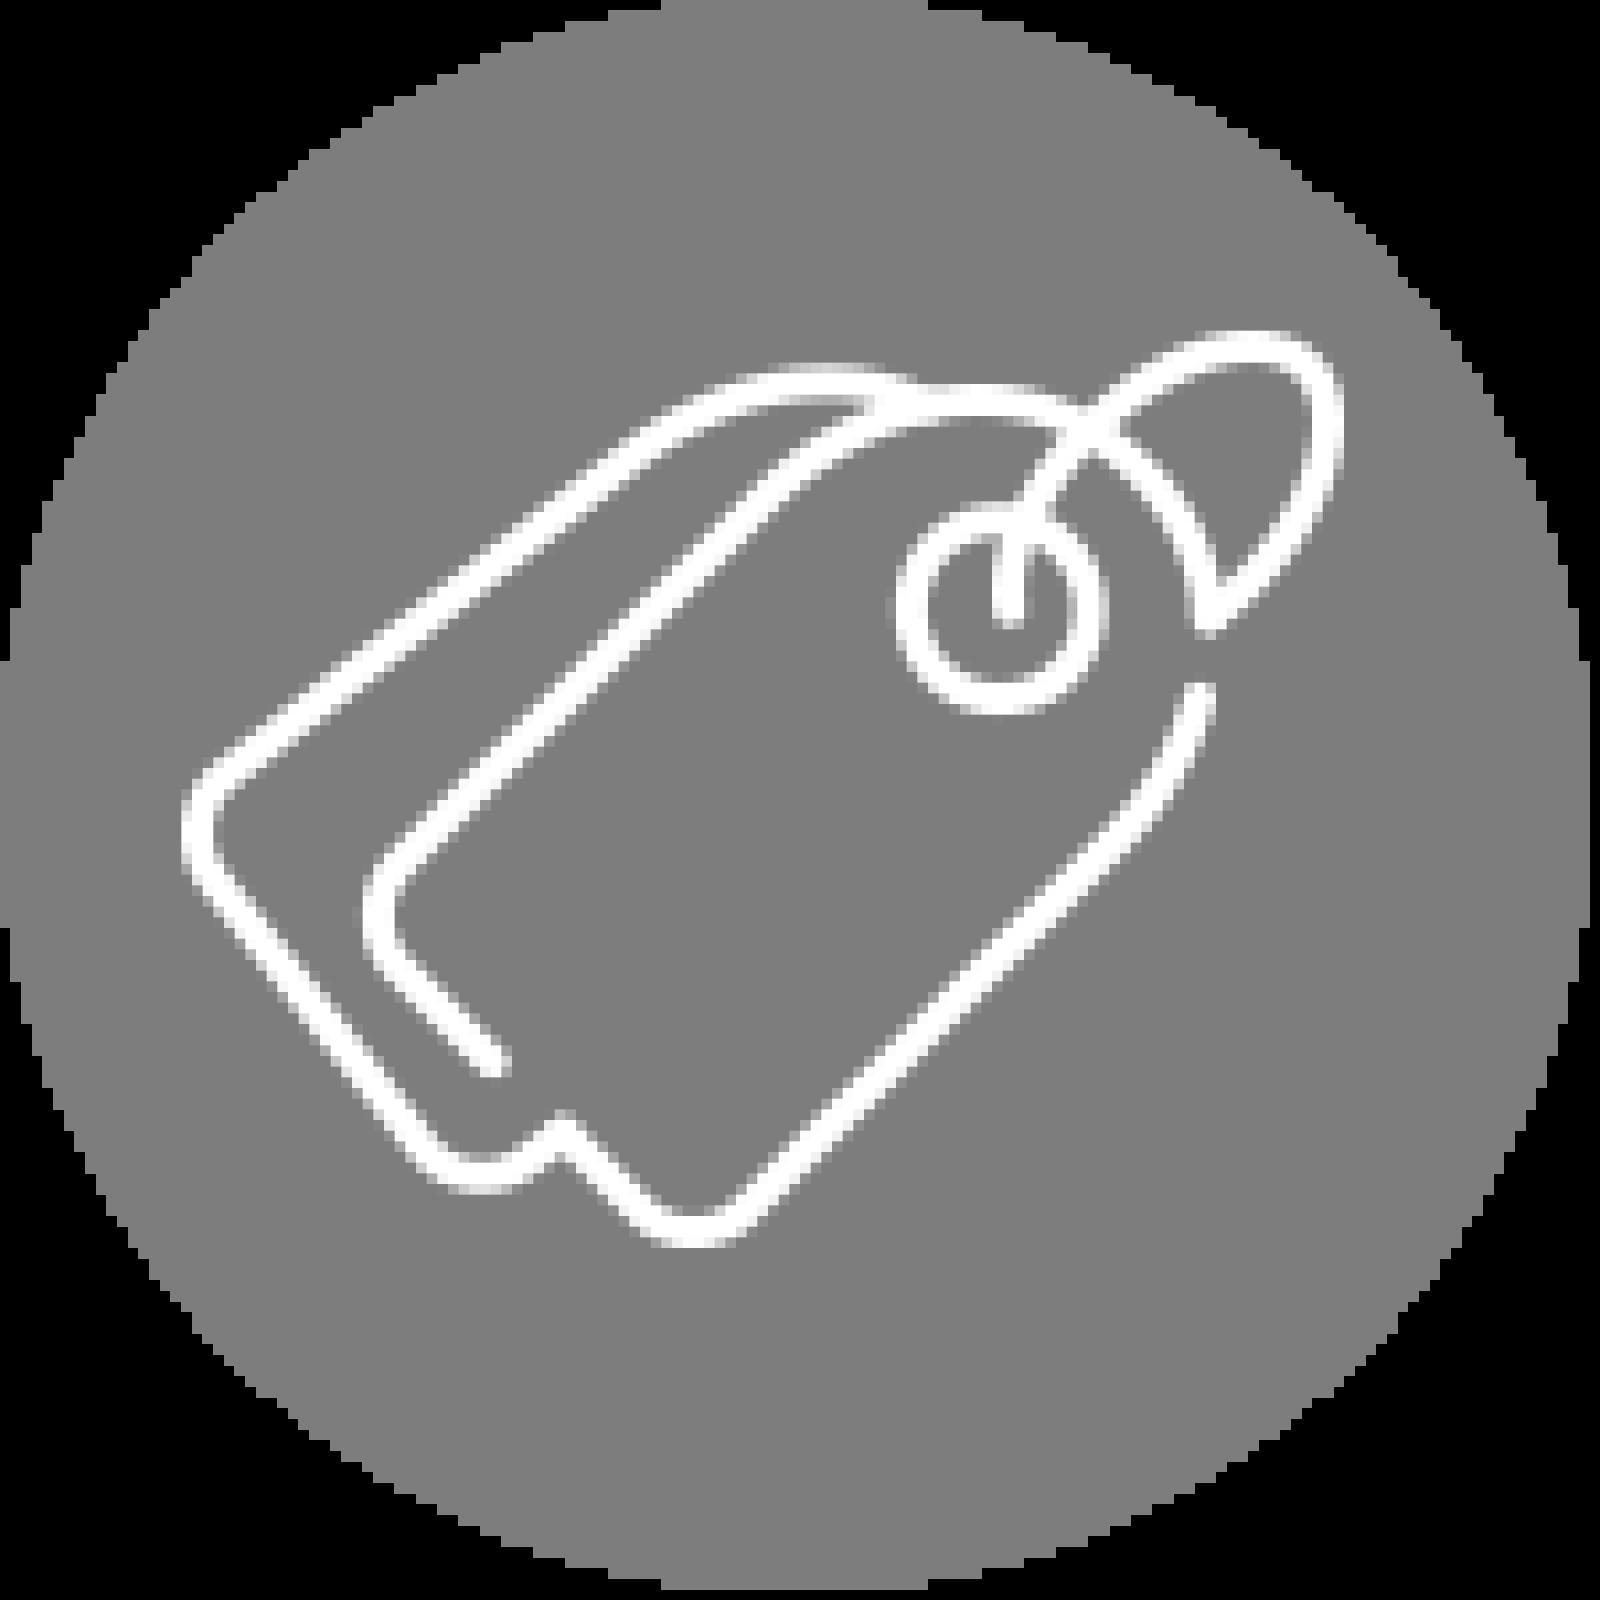 Icone simbolo loja